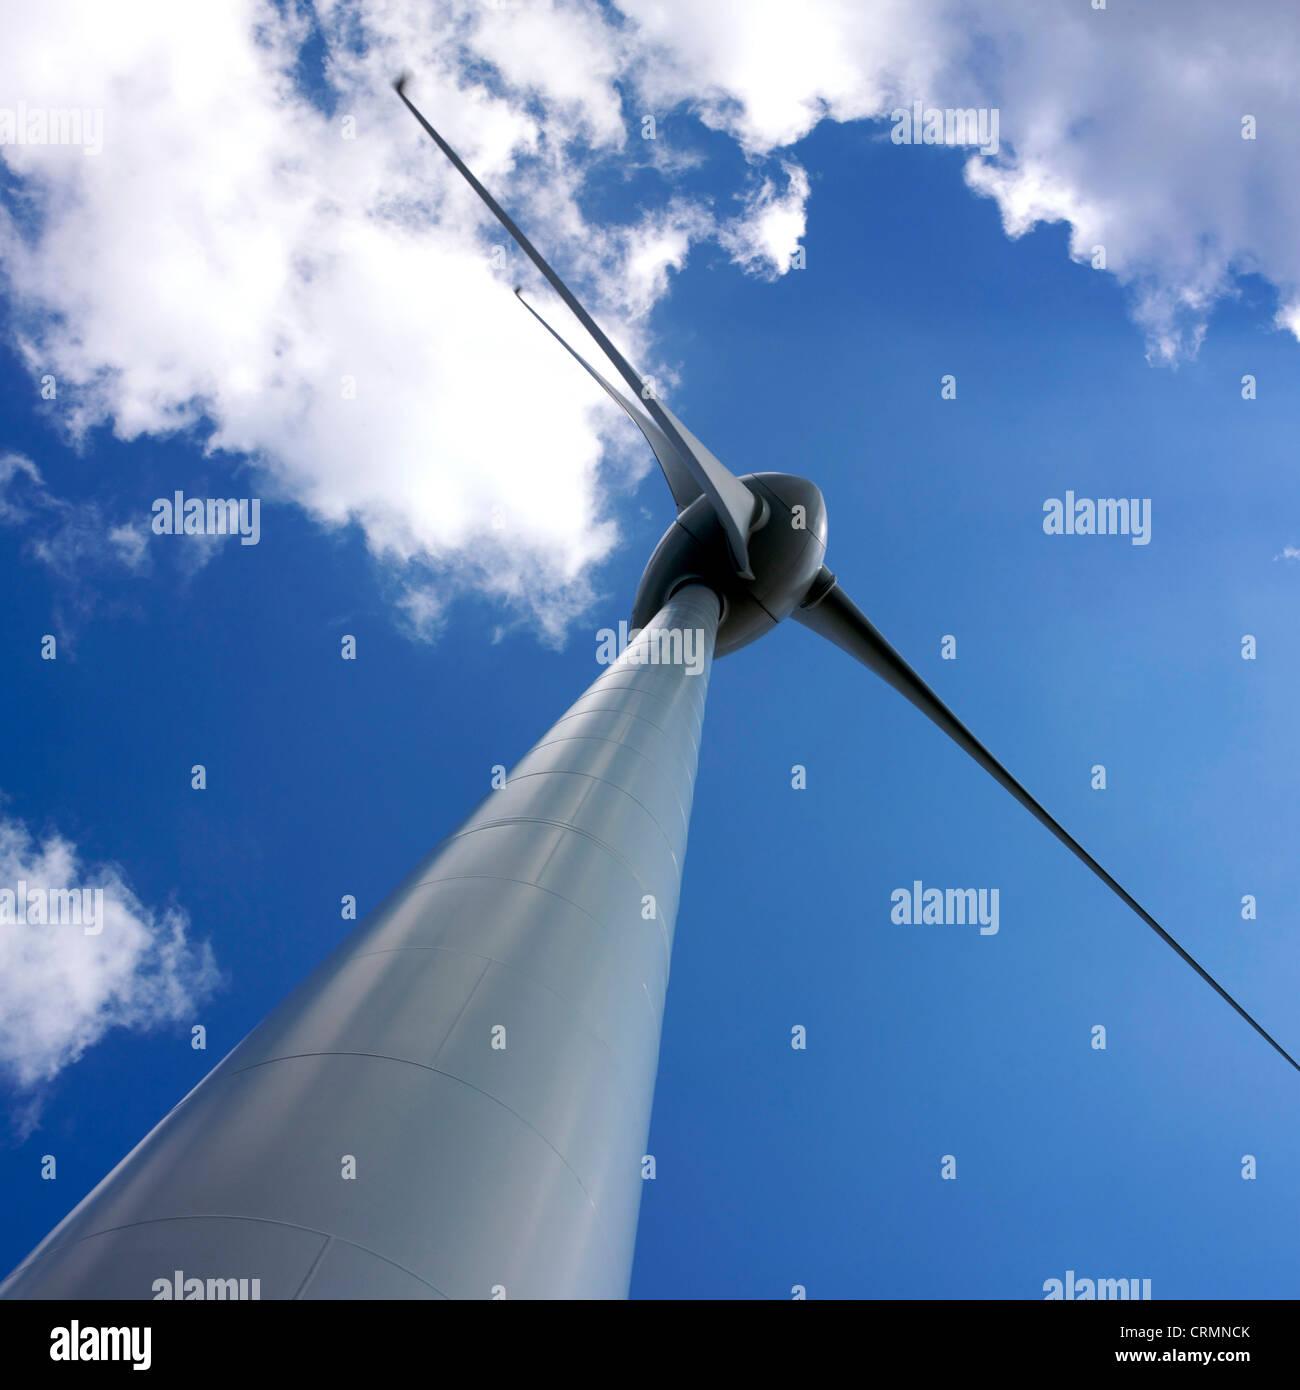 Wind turbine detail - Stock Image